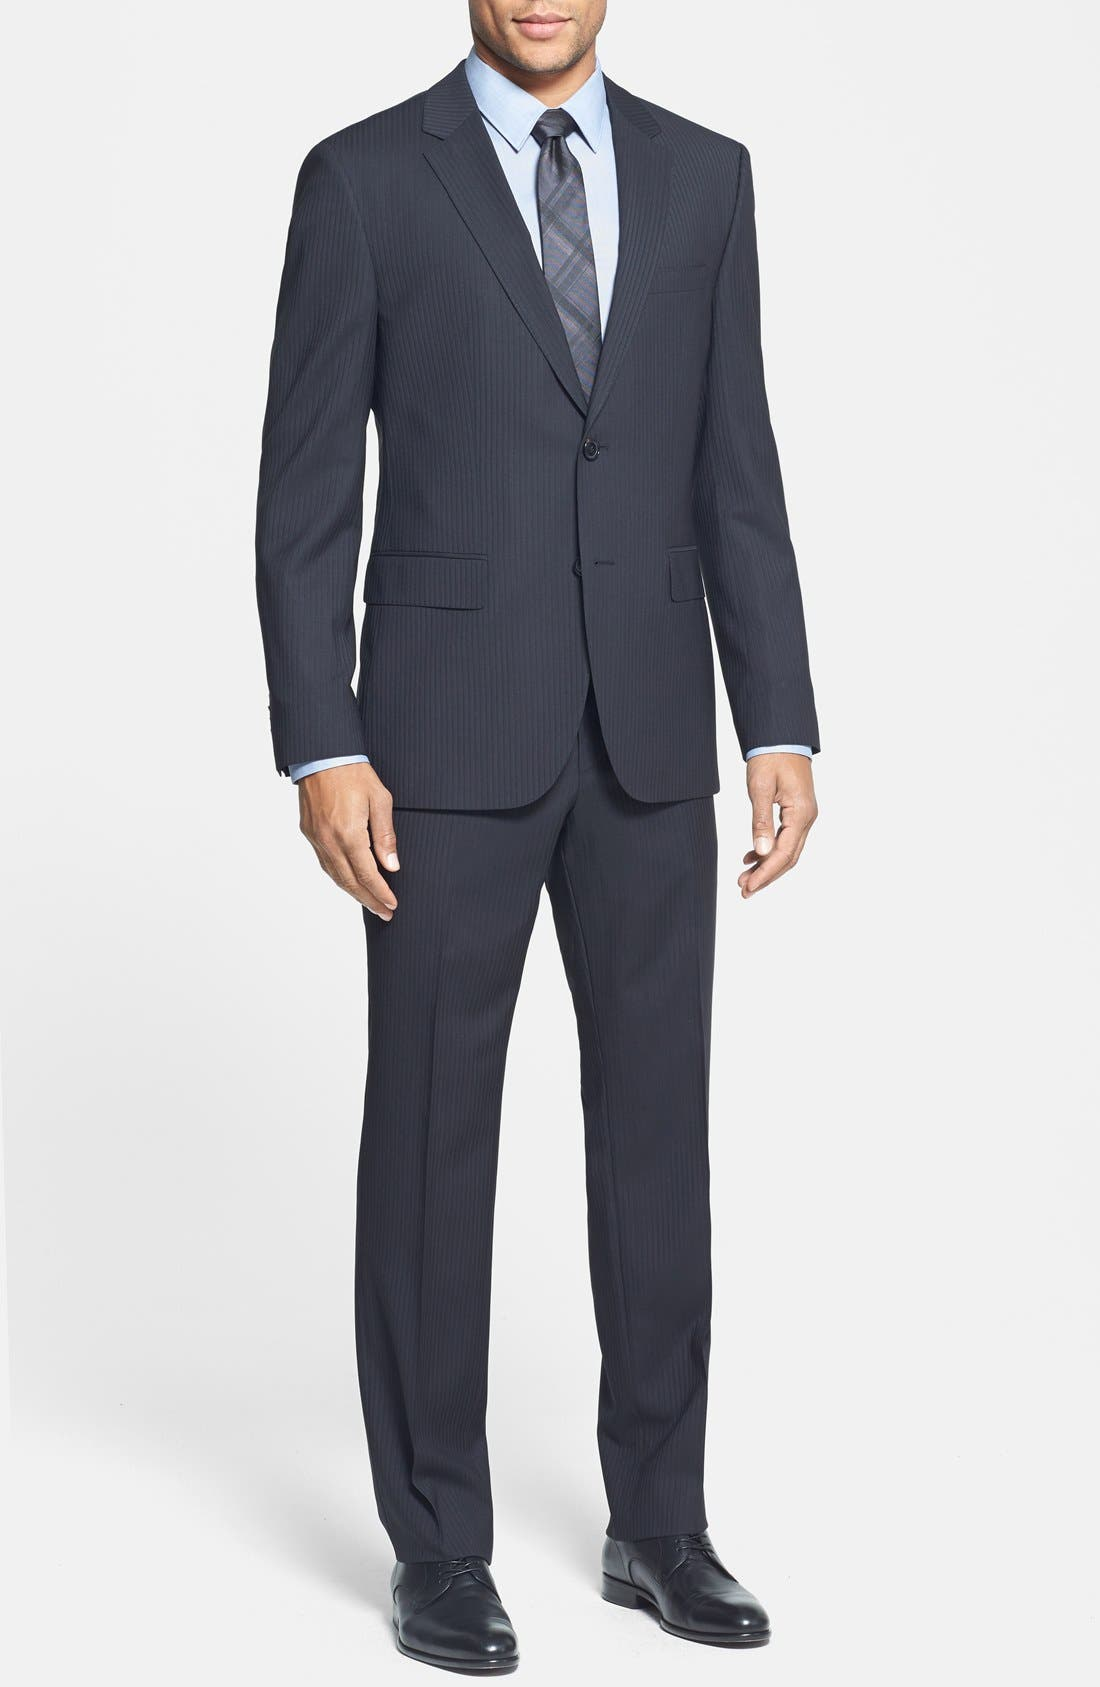 Main Image - BOSS HUGO BOSS 'James/Sharp' Trim Fit Stripe Suit